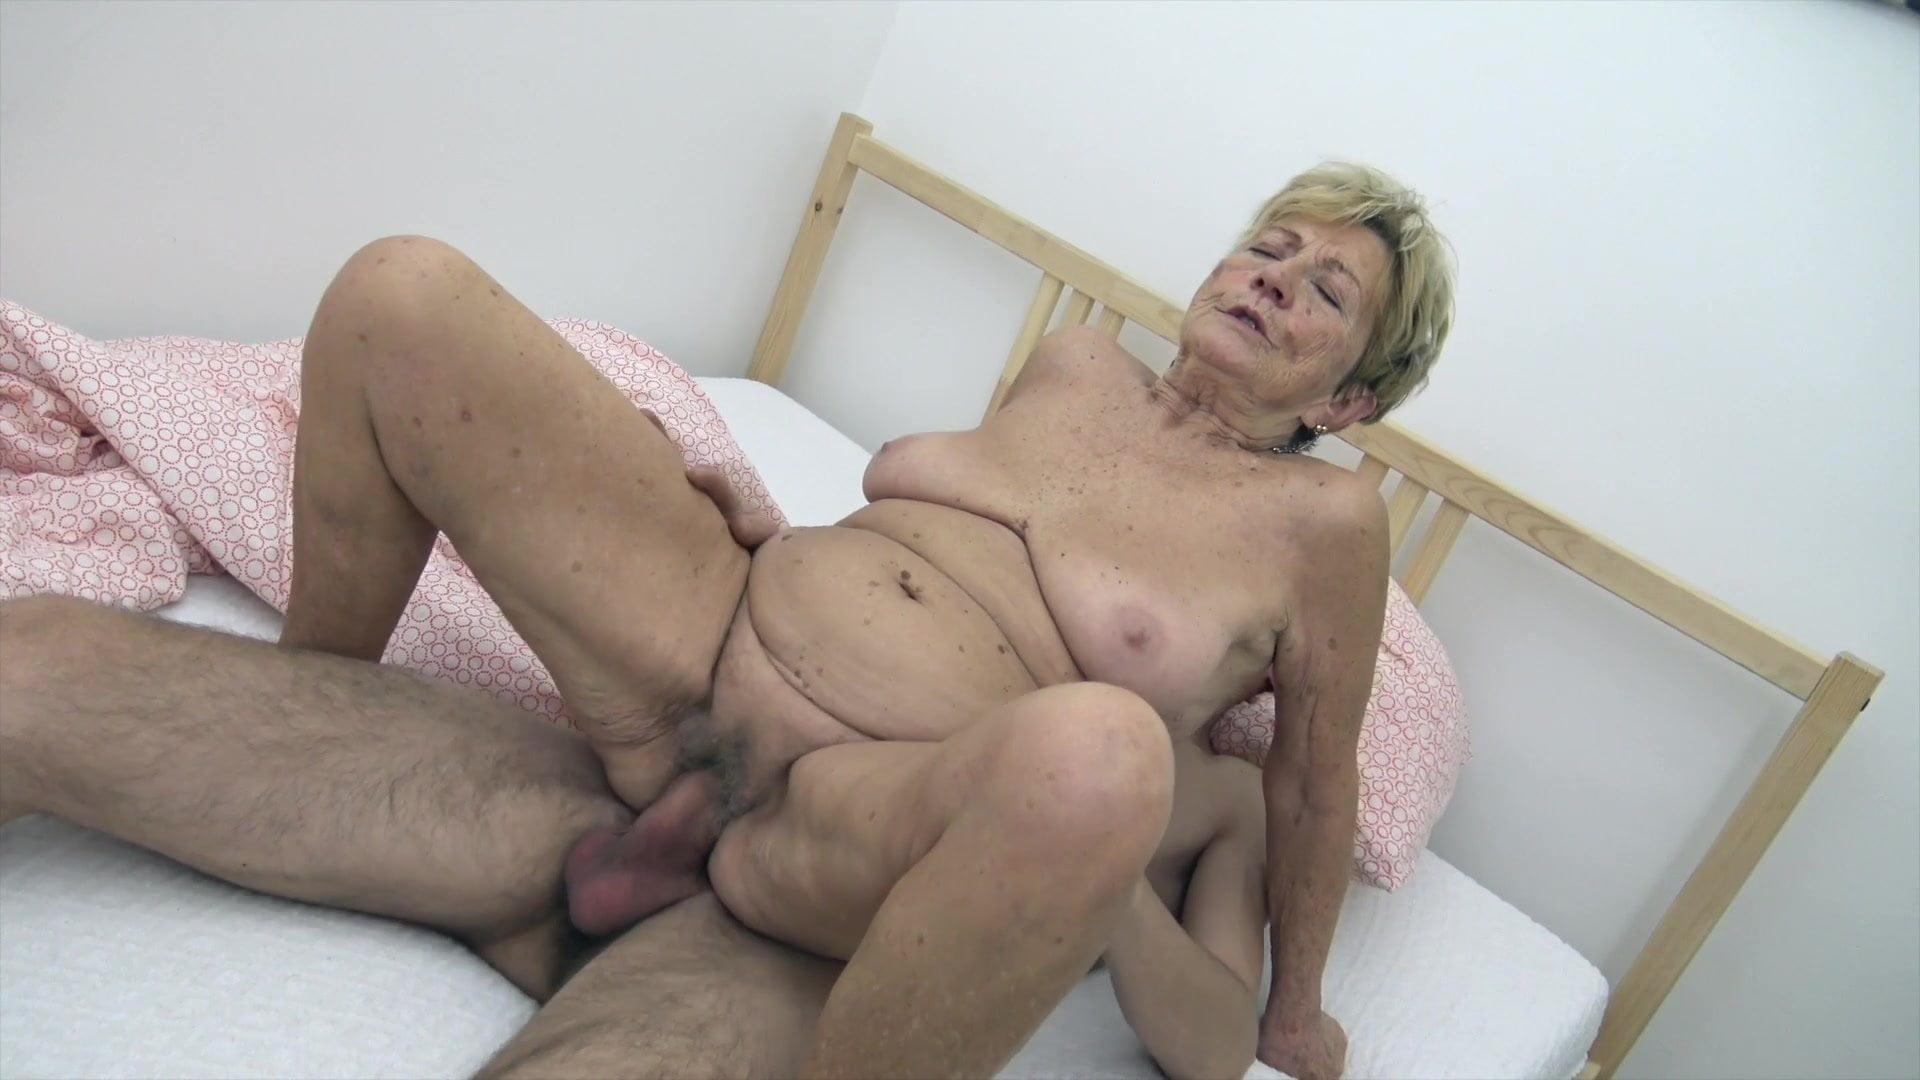 бесплатно порно бабушка дрочит